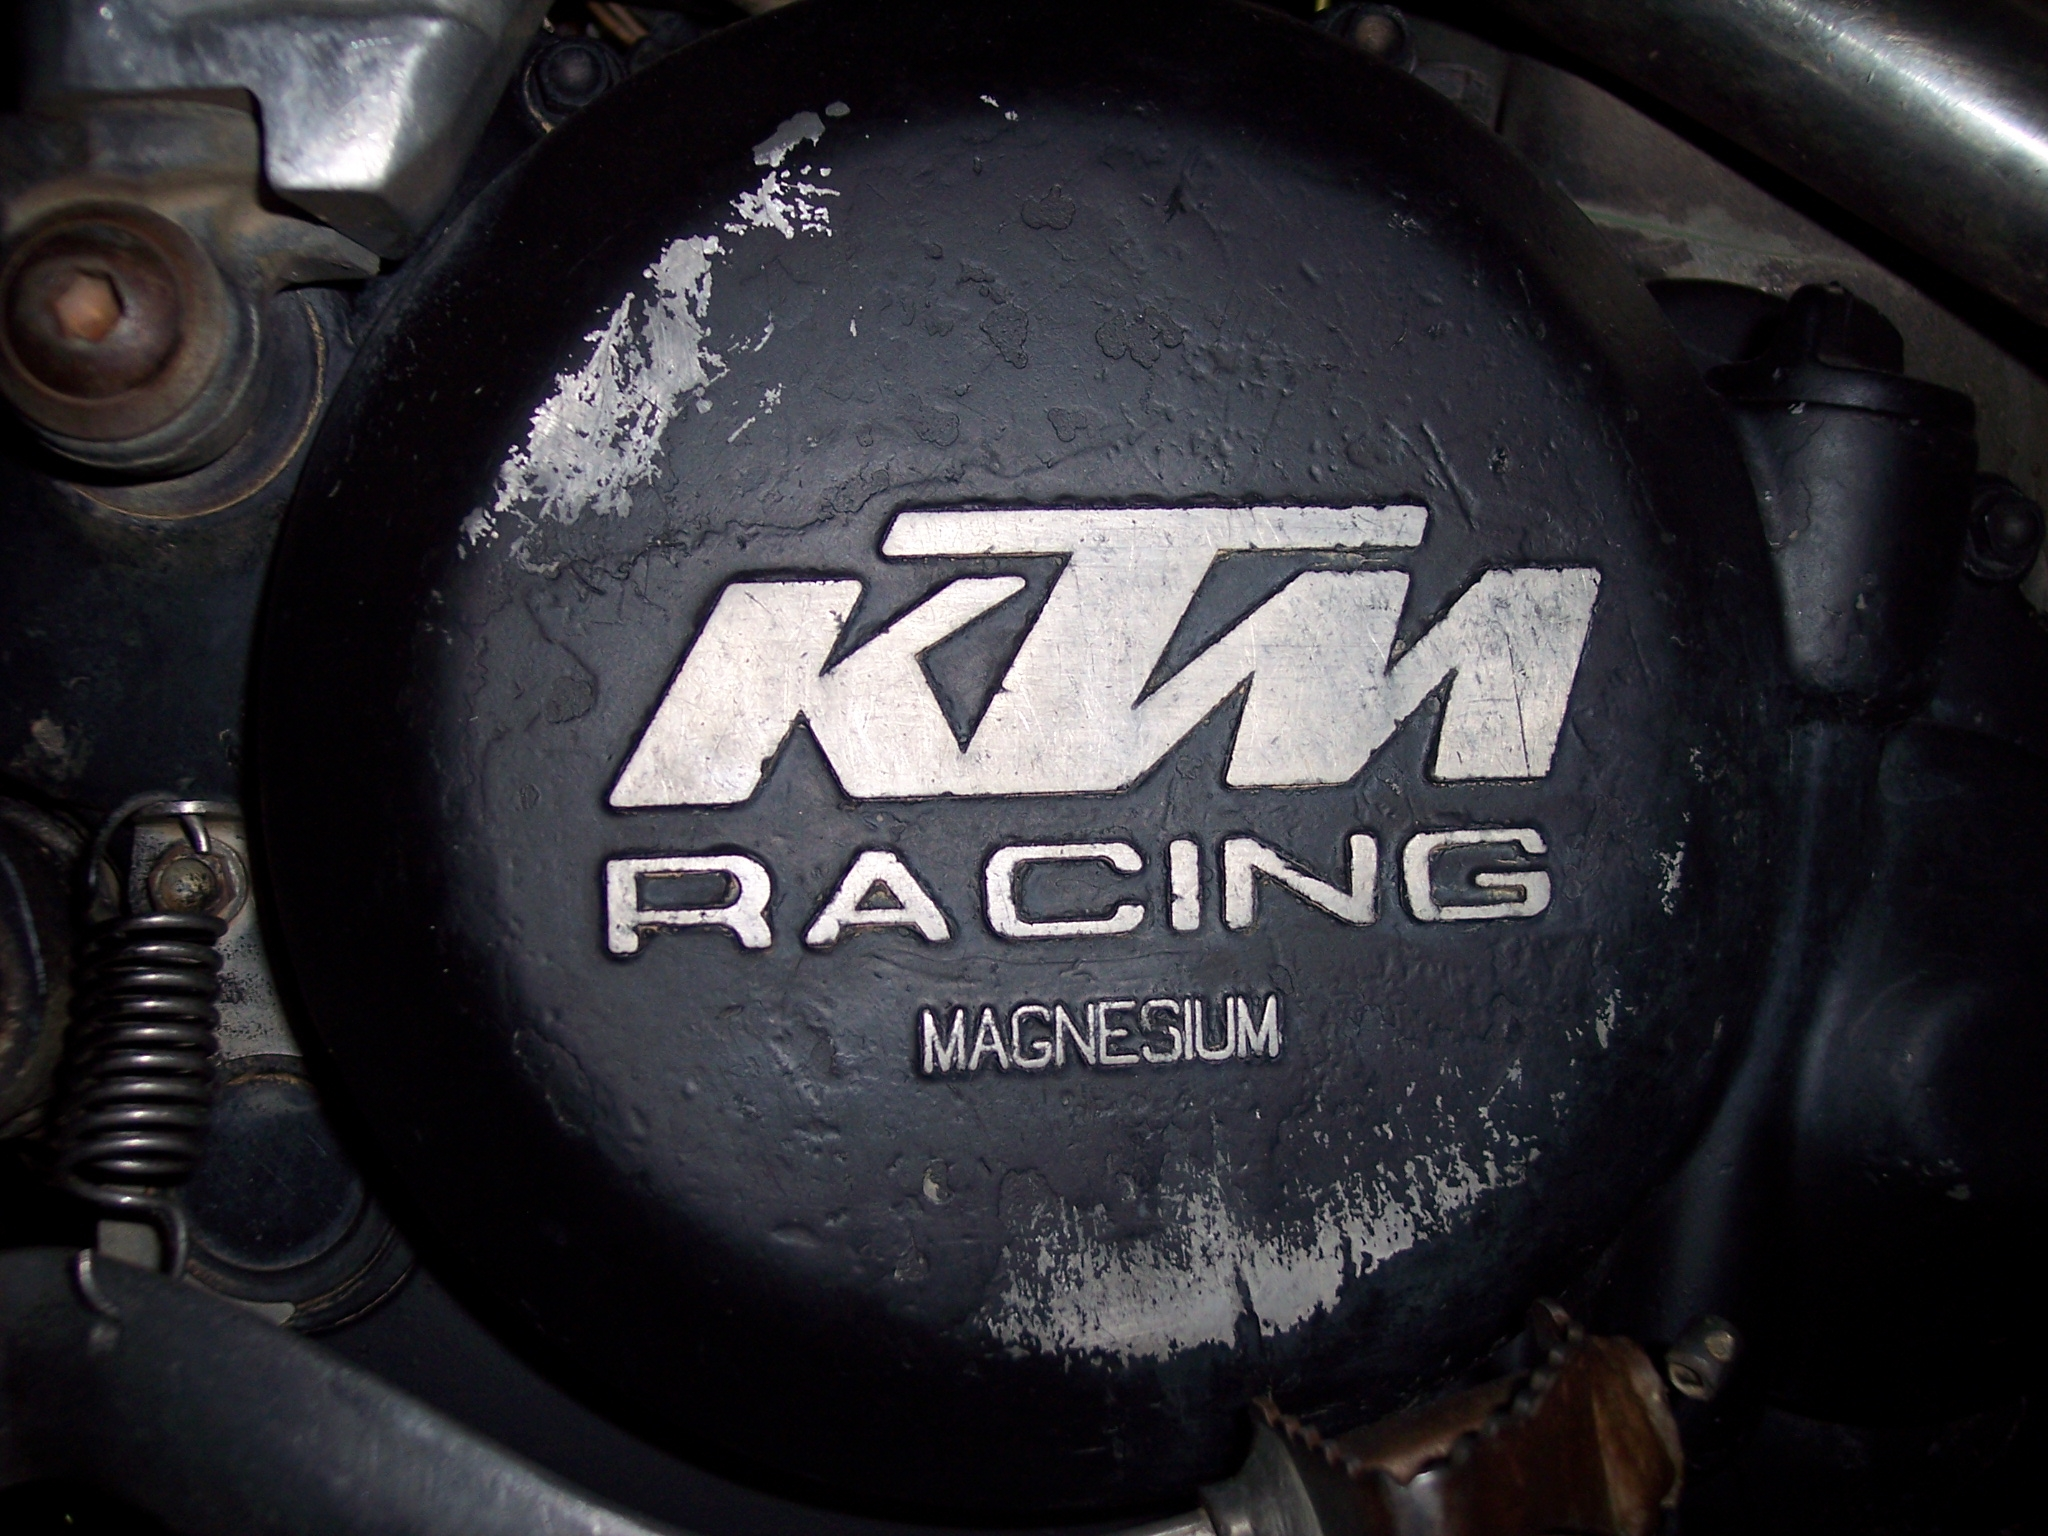 KTM Racing Magnesium by ersin 2048x1536